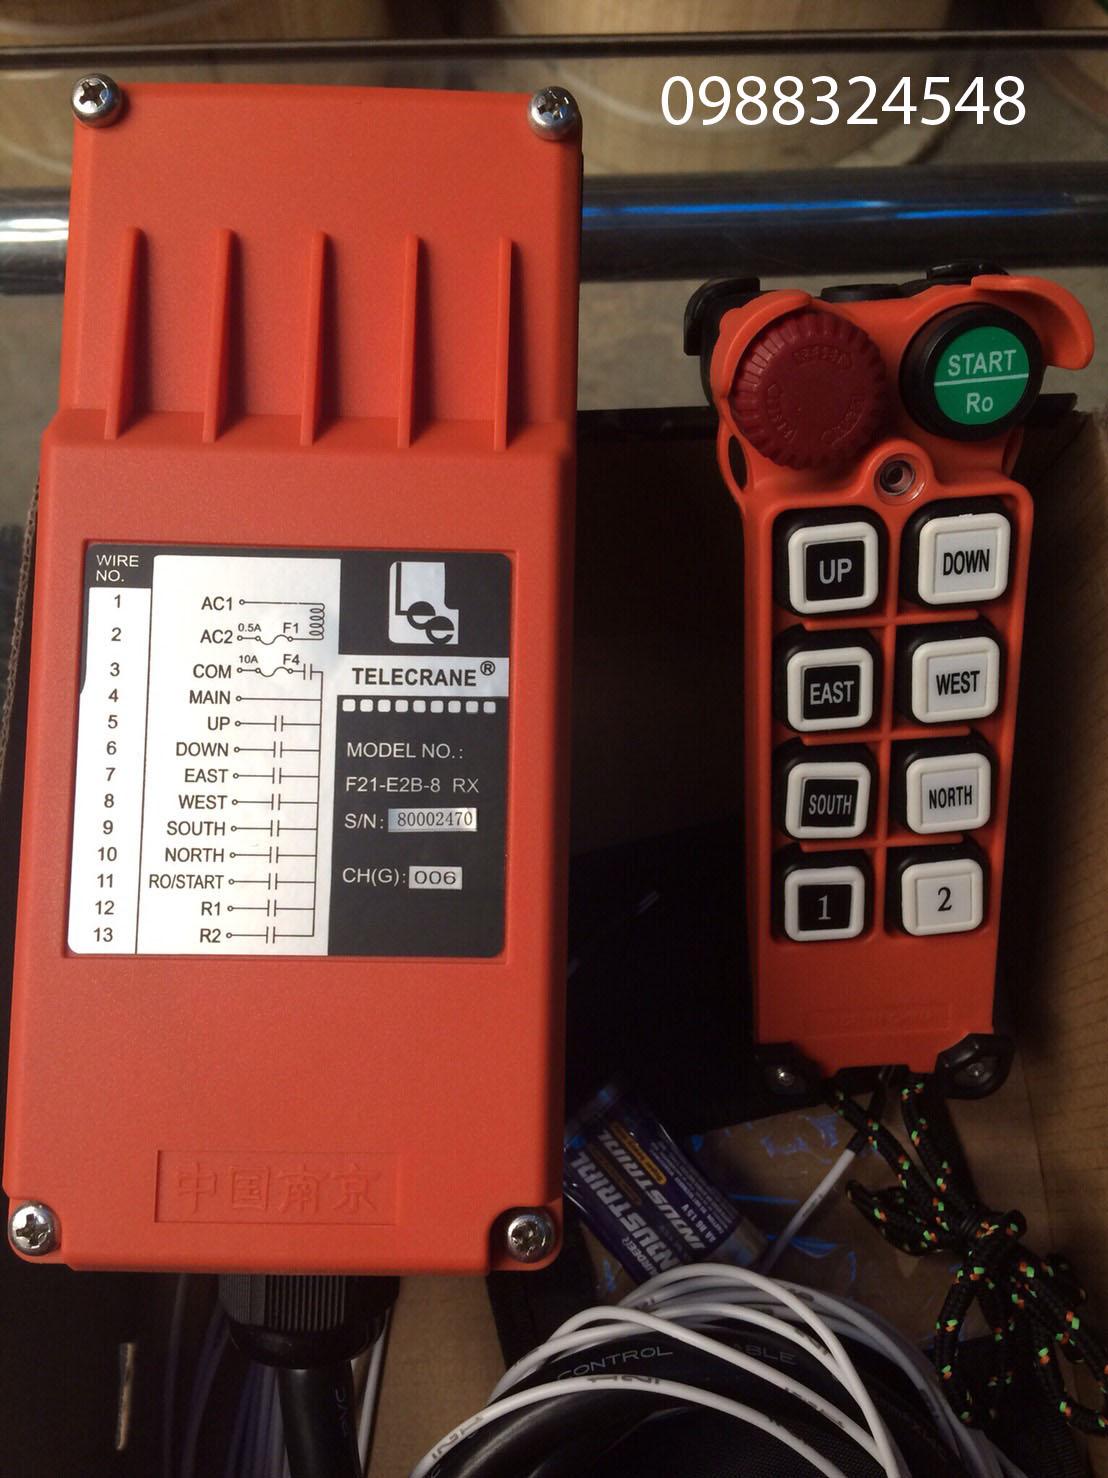 Bộ điều khiển từ xa Telecrane F21-E2B-8